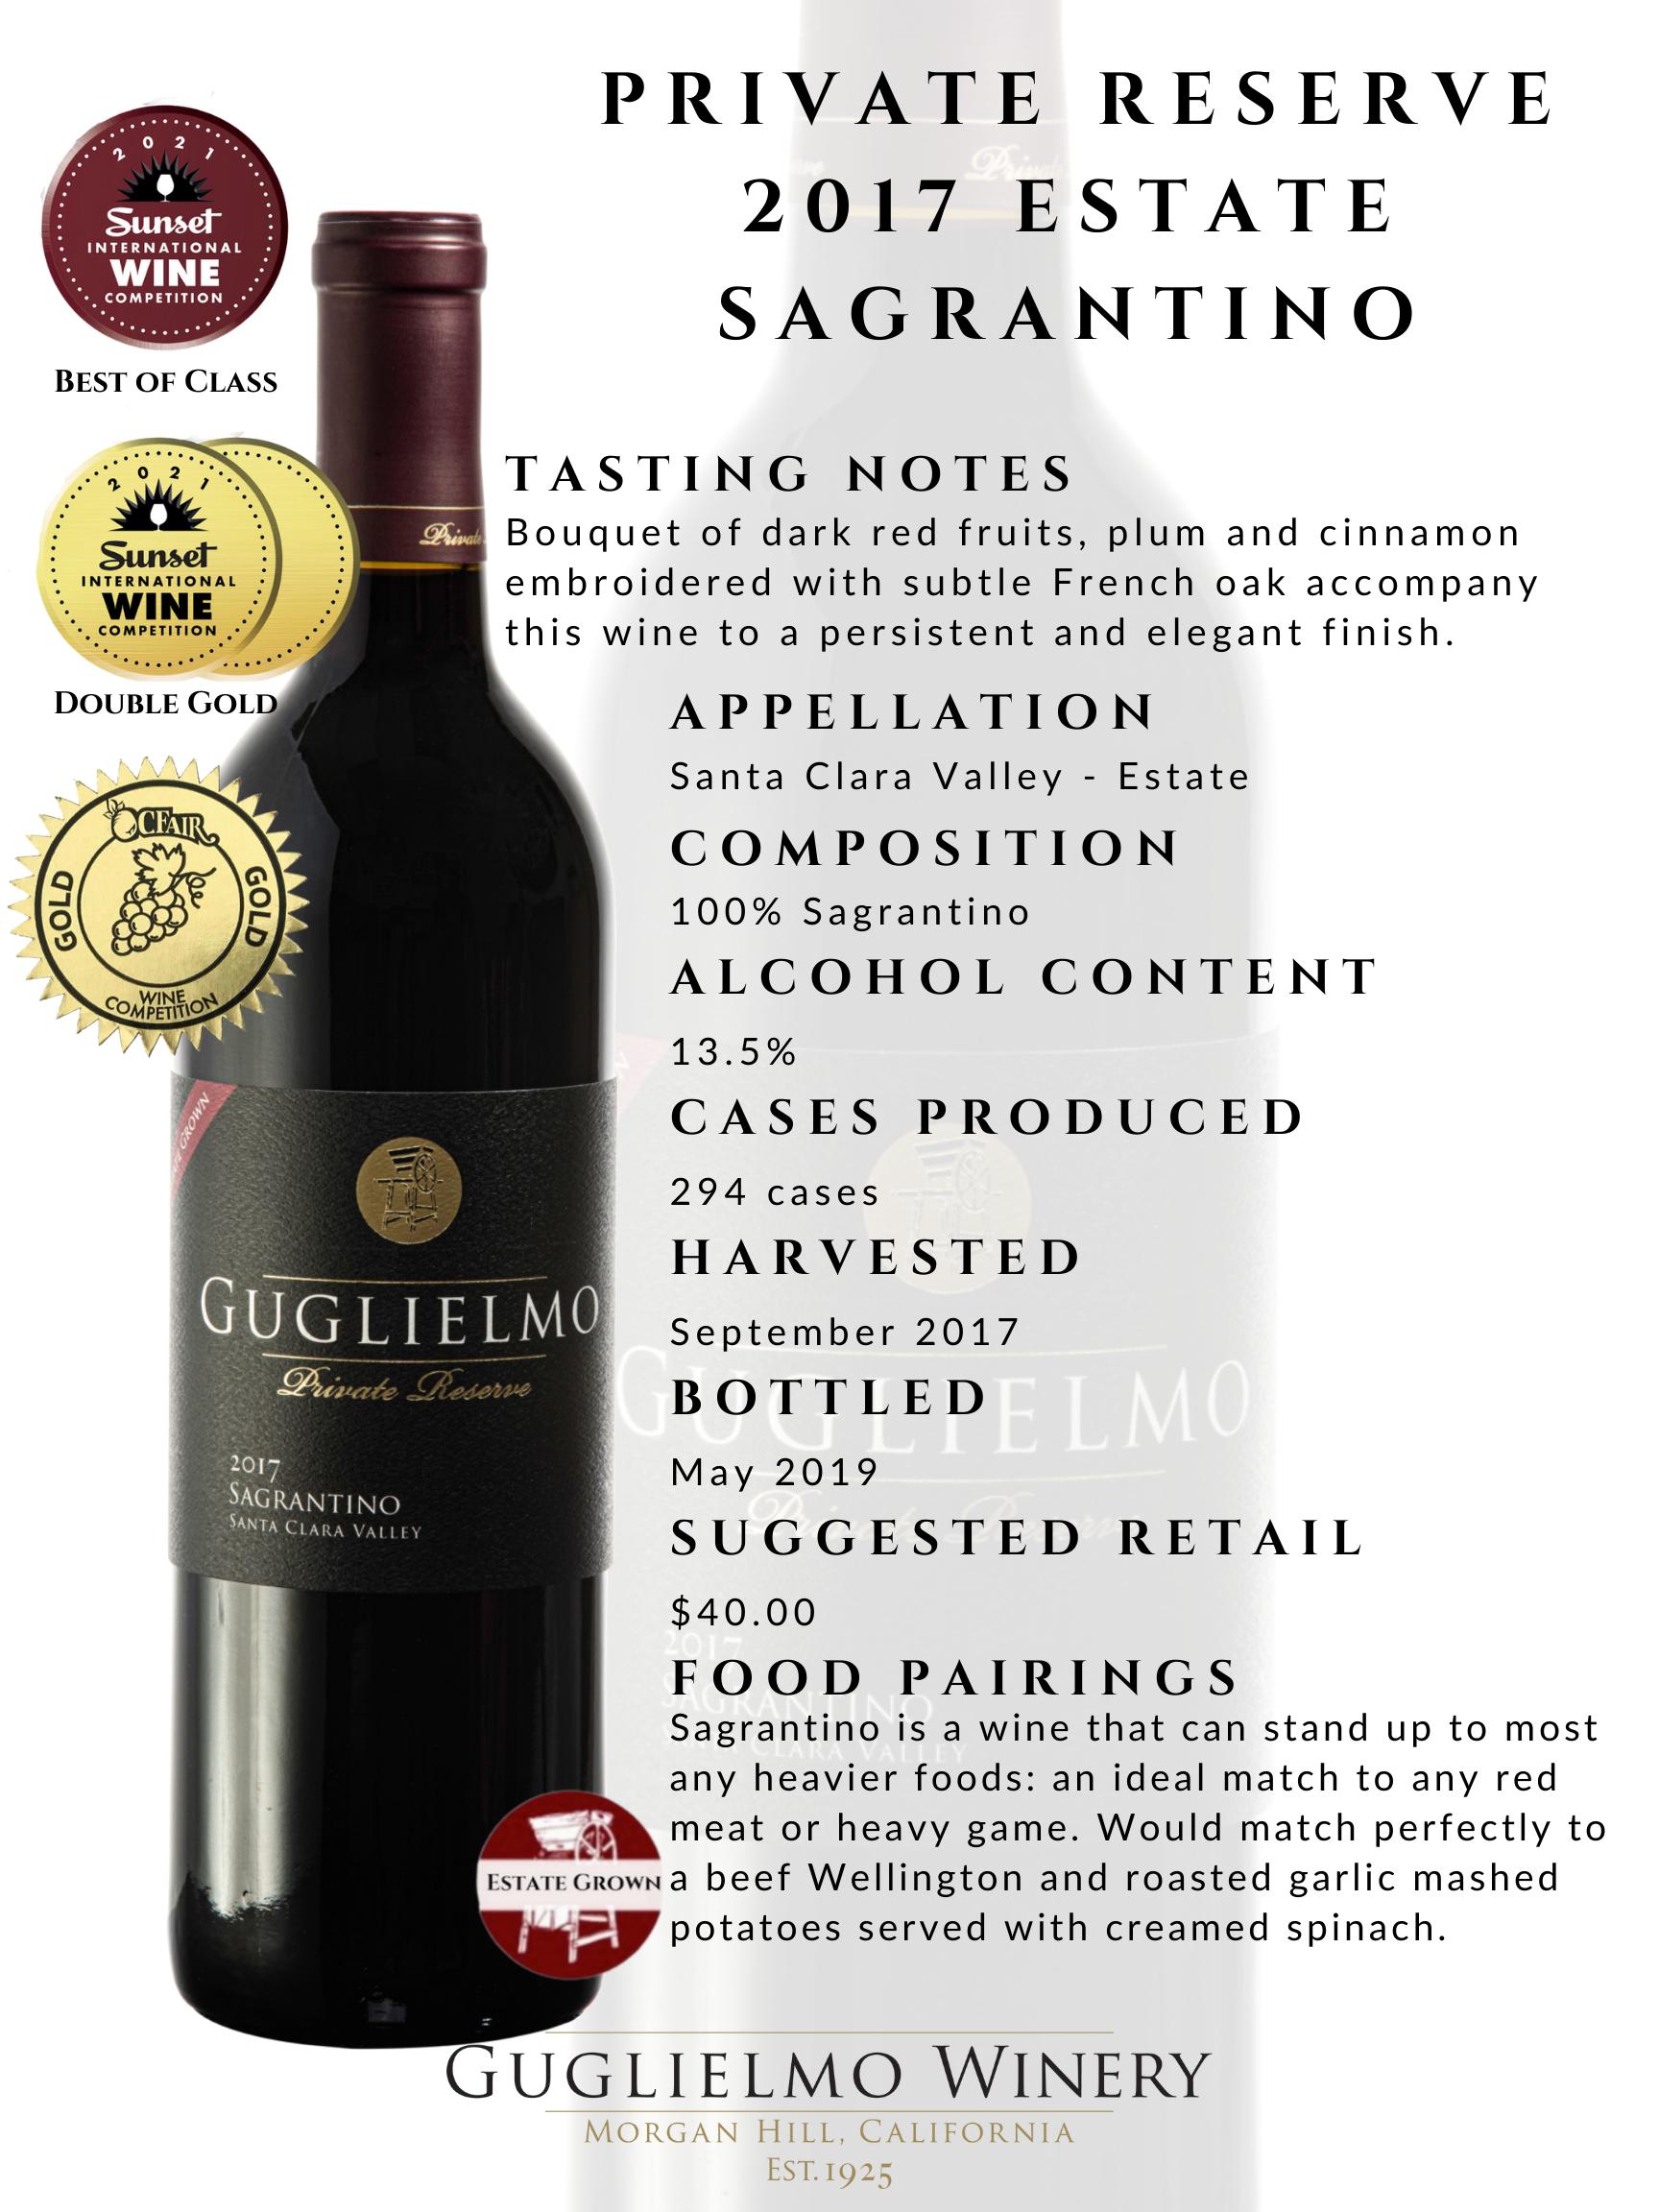 Private Reserve Sagrantino 2017 Fact Sheet